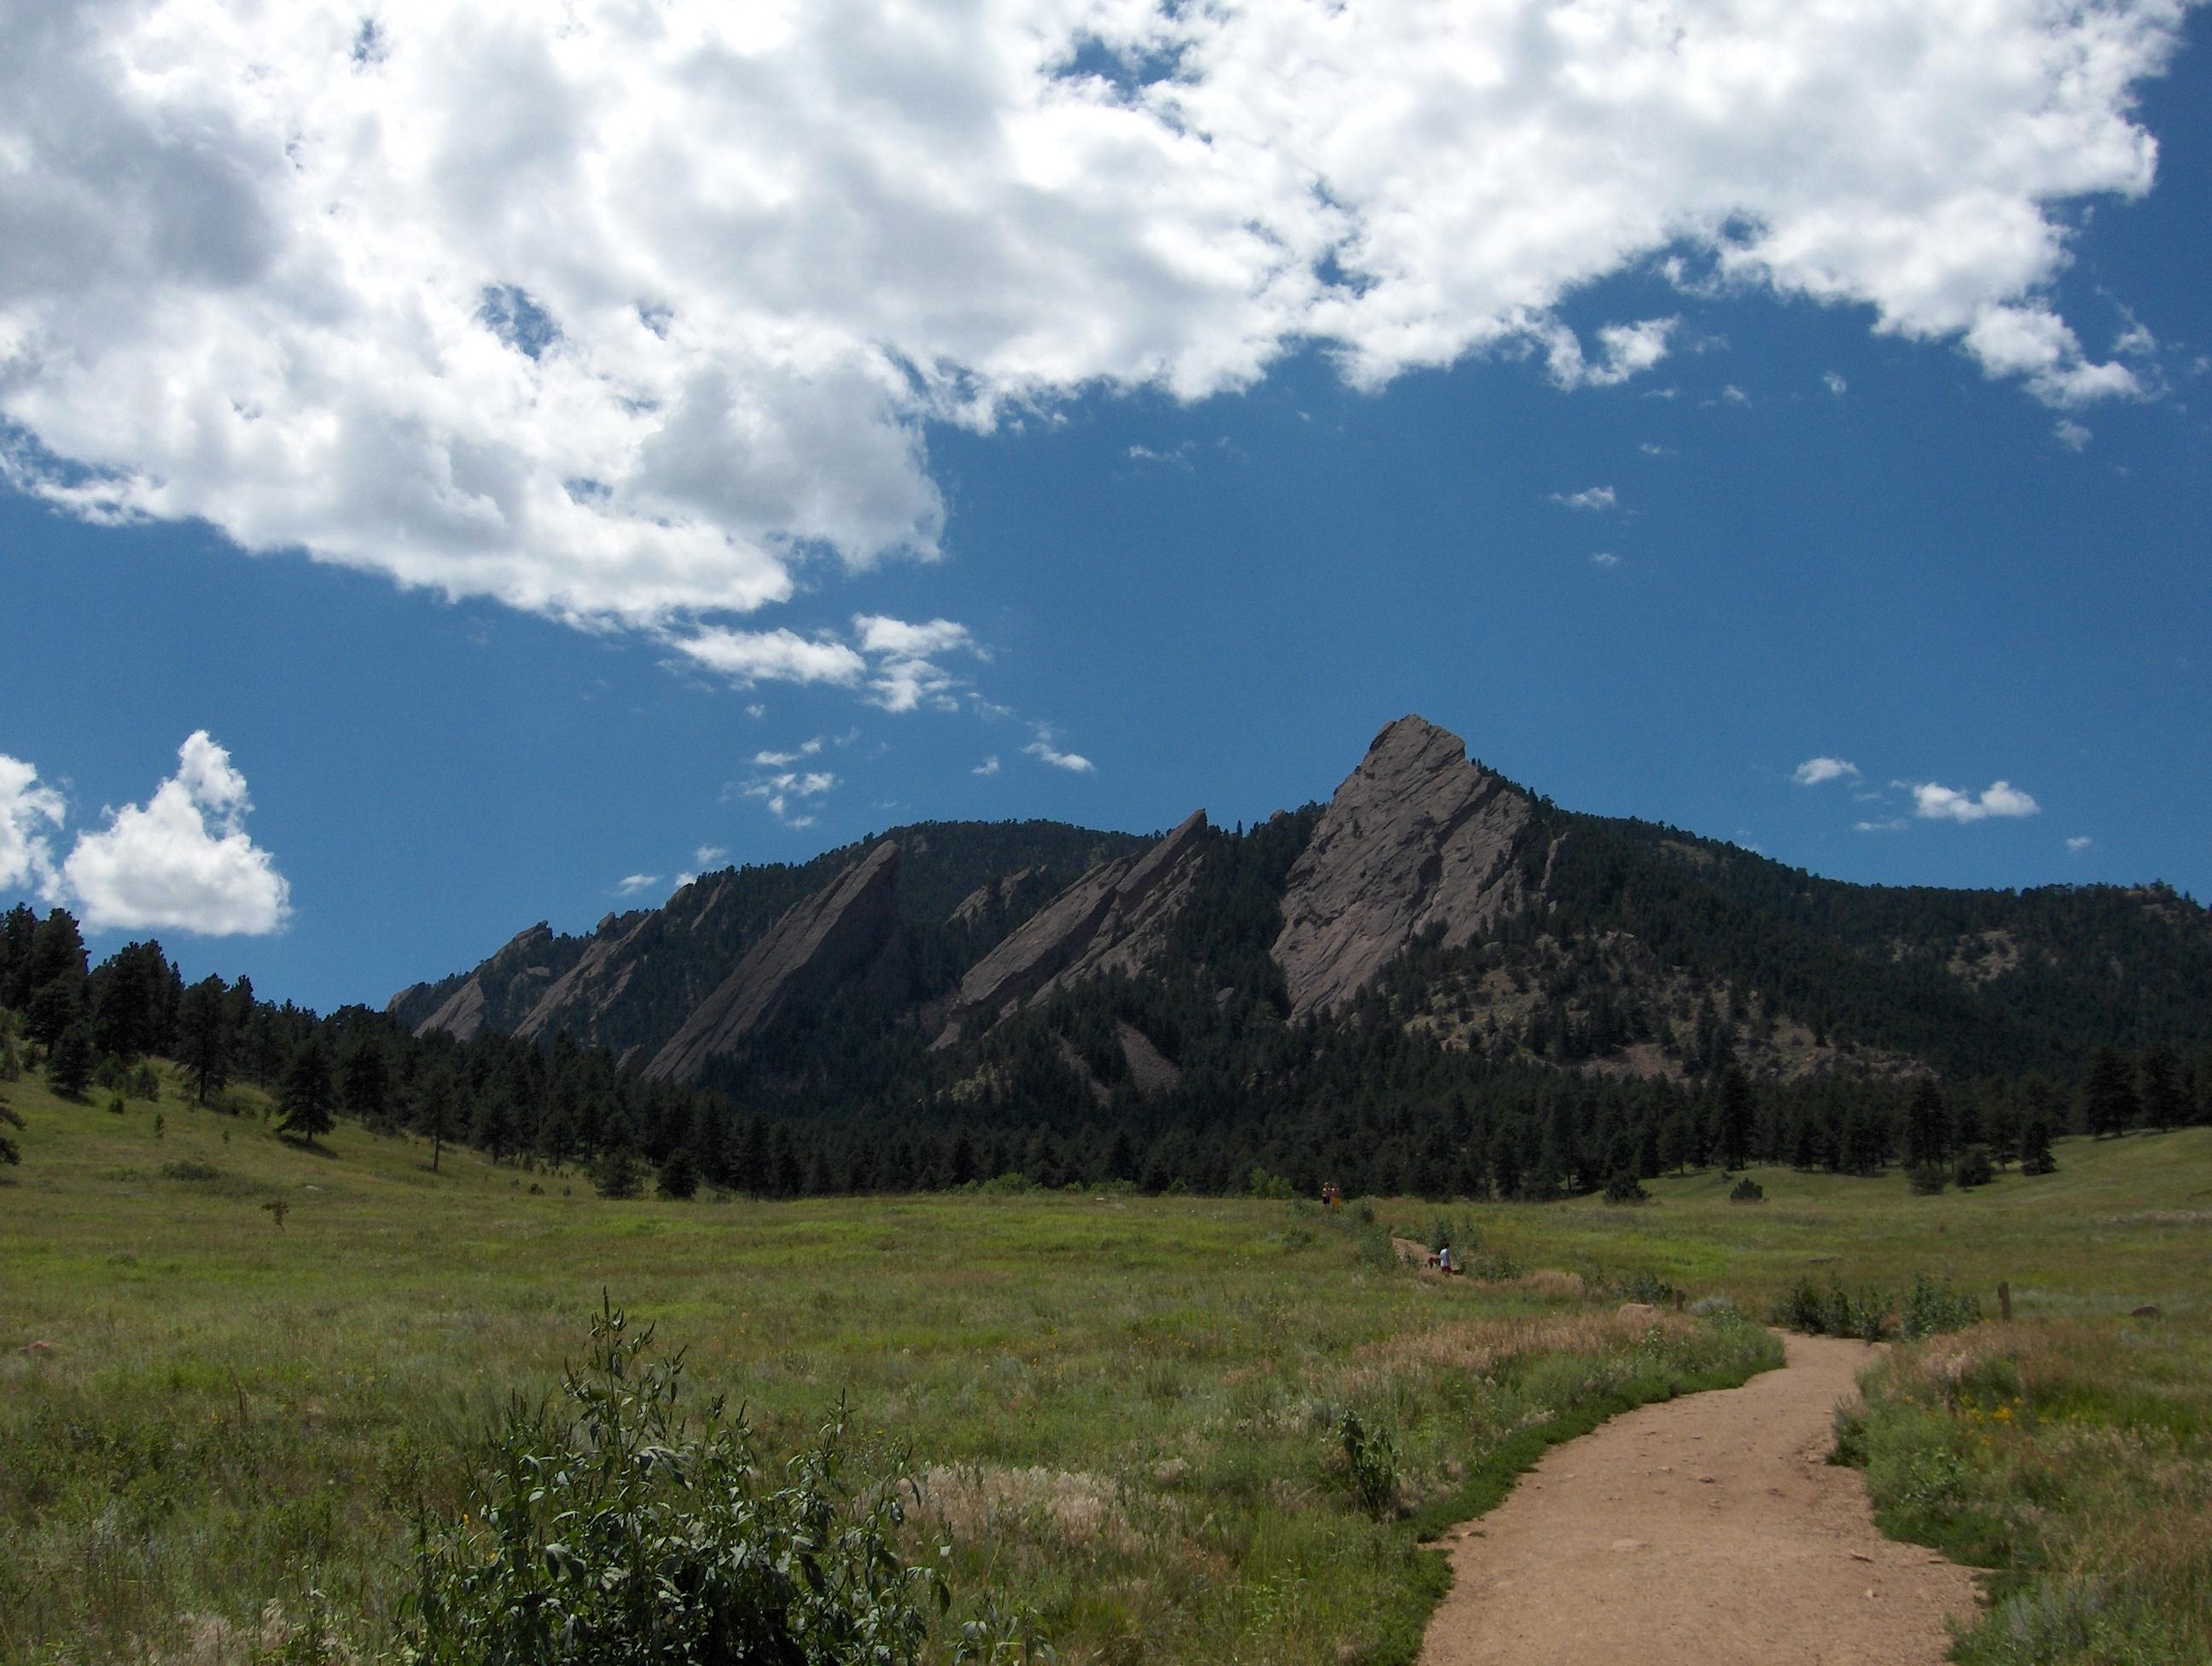 tipos empregos Boulder Colorado EUA